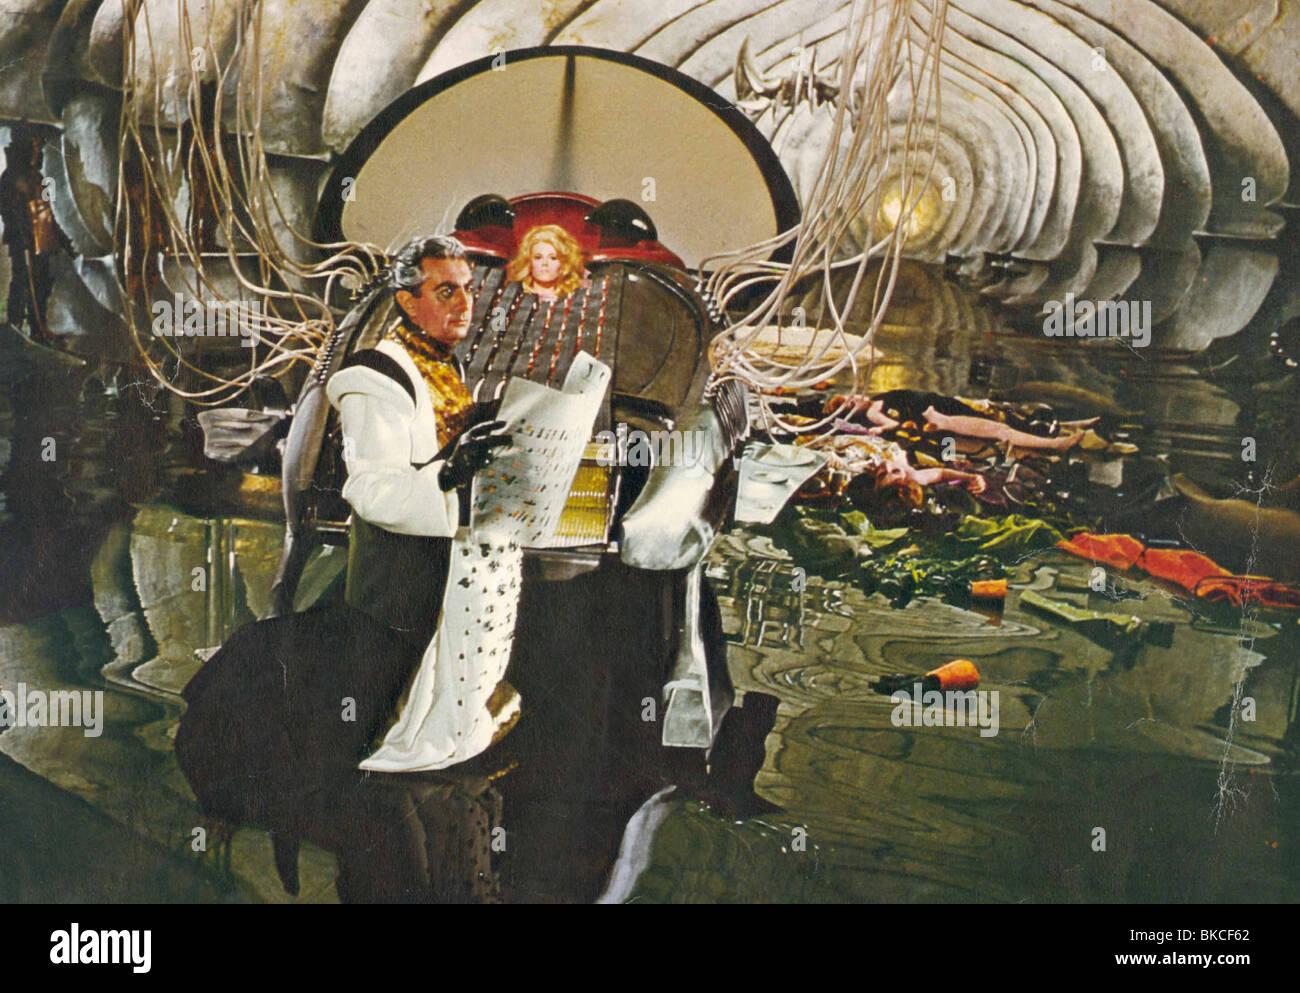 BARBARELLA (1967) MILO O'SHEA, DURAND DURAND, JANE FONDA, BARBARELLA BRB 001FOH - Stock Image